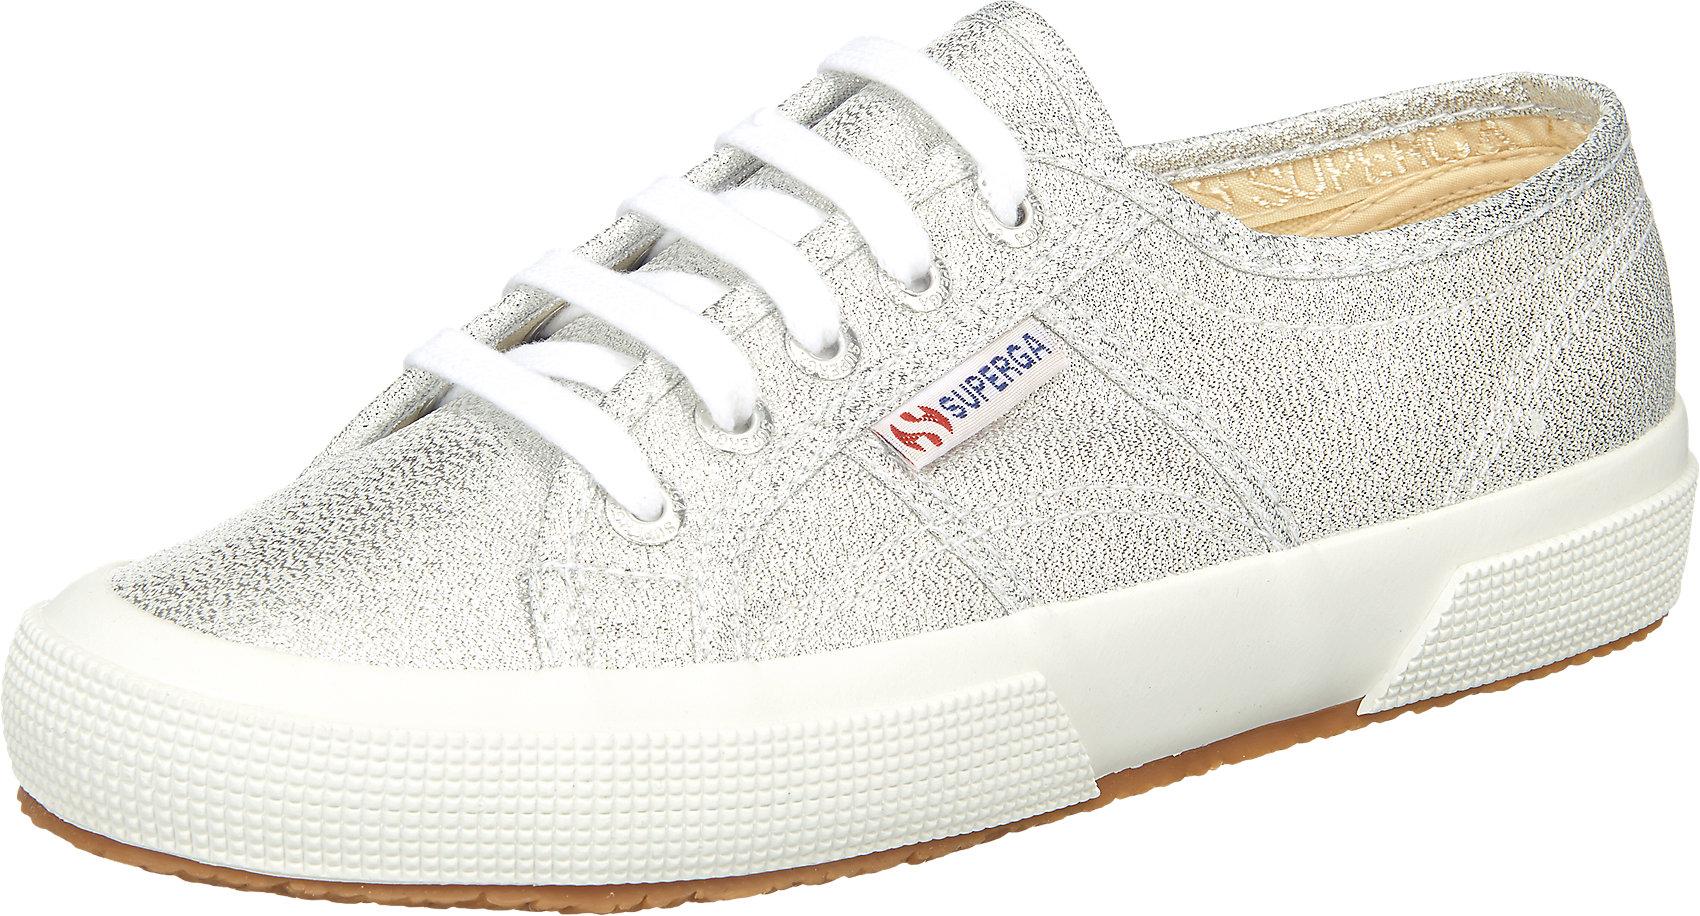 Details zu Neu Superga® 2750 Lamew Sneakers Low 5748461 für Damen silber